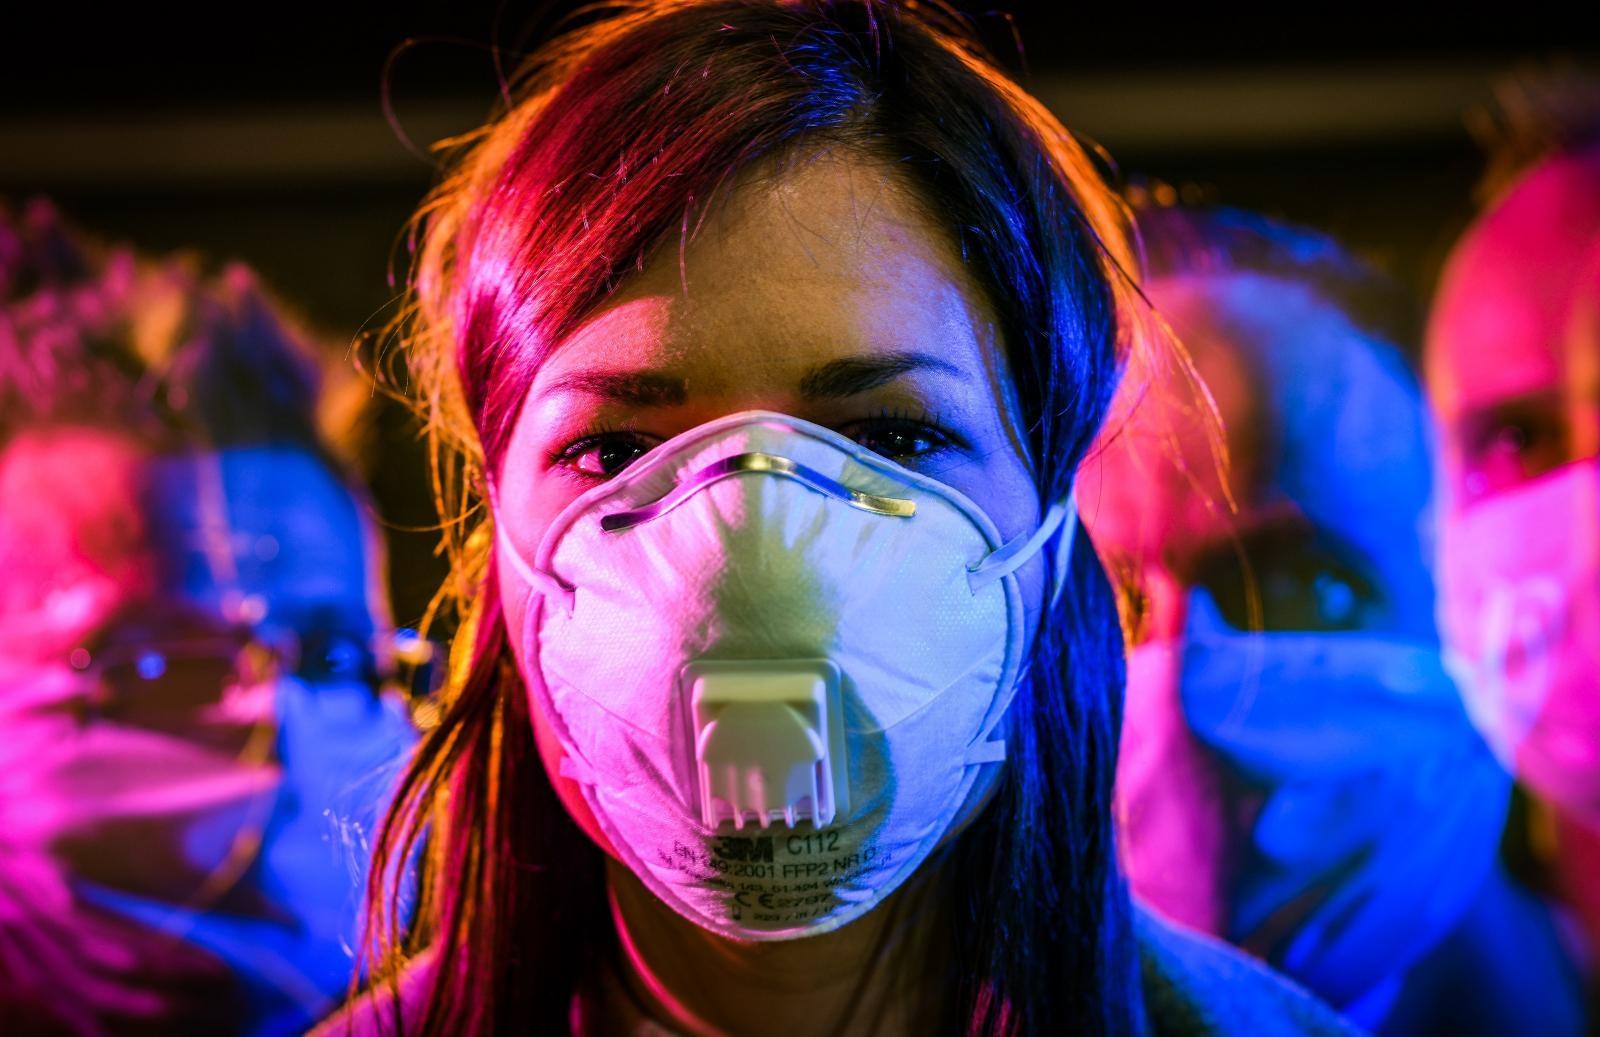 (FOTO) MODNI PROMAŠAJ ILI HIT? Nakon raznih motiva na maskama, dolaze i neobični modni dodaci na istima!